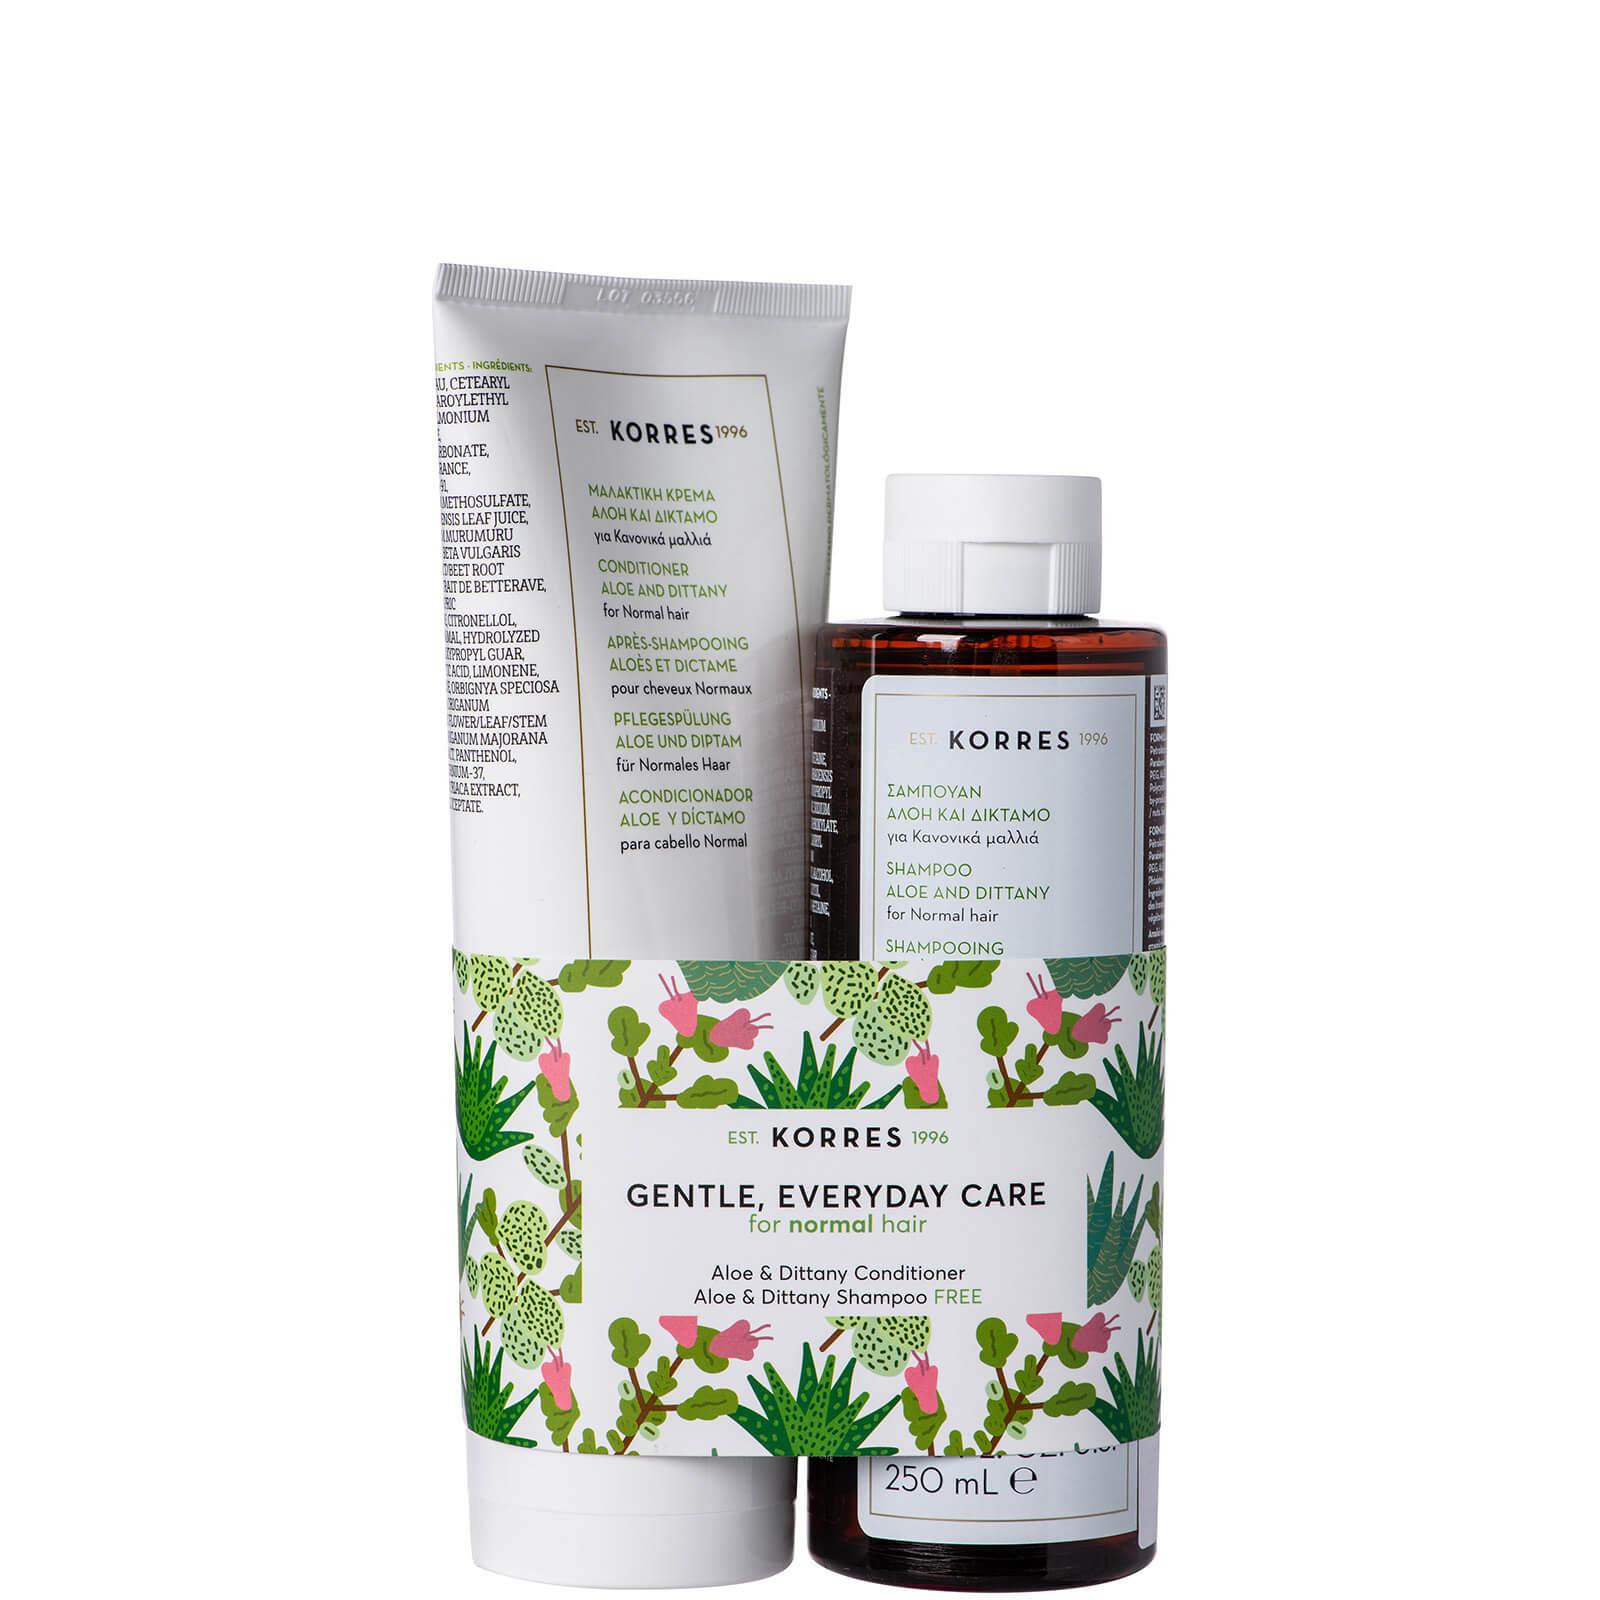 Купить KORRES Aloe & Dittany Kit Conditioner and Shampoo Duo